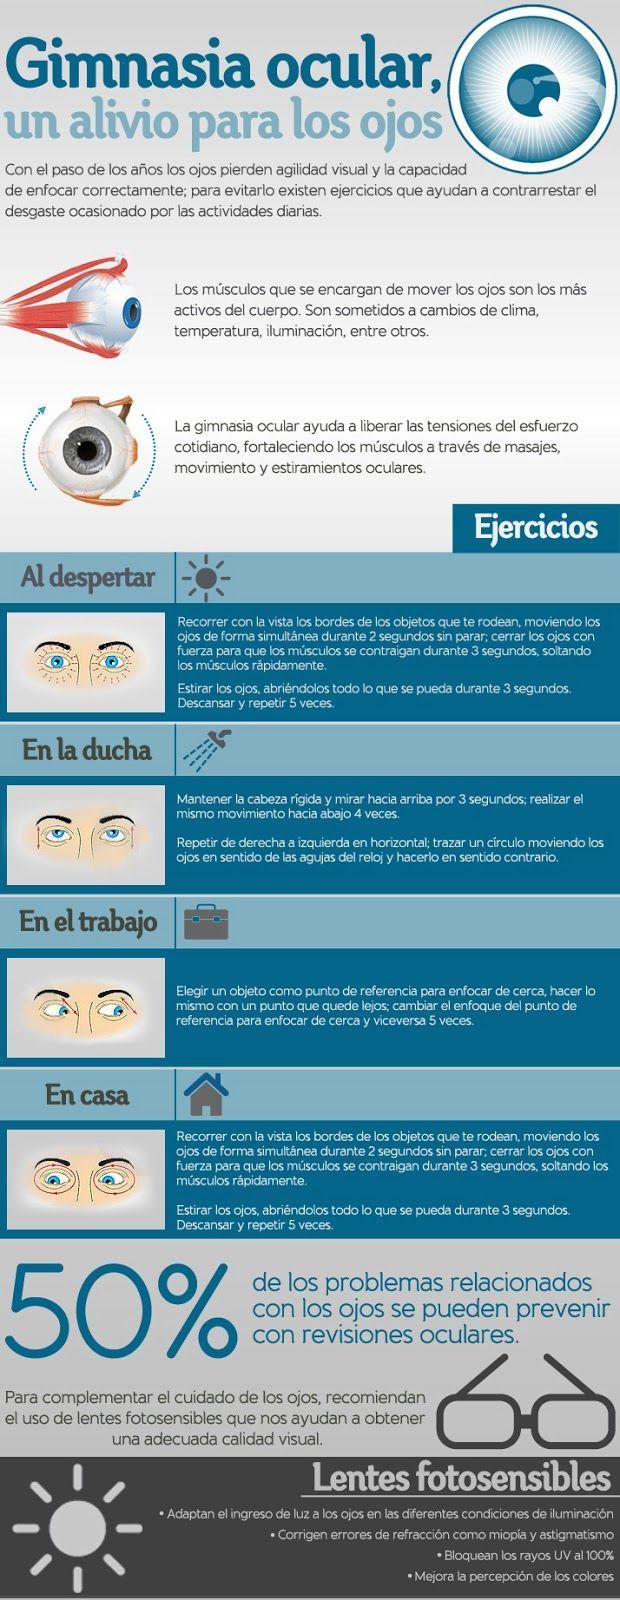 Gimnasia ocular: un alivio para tus ojos